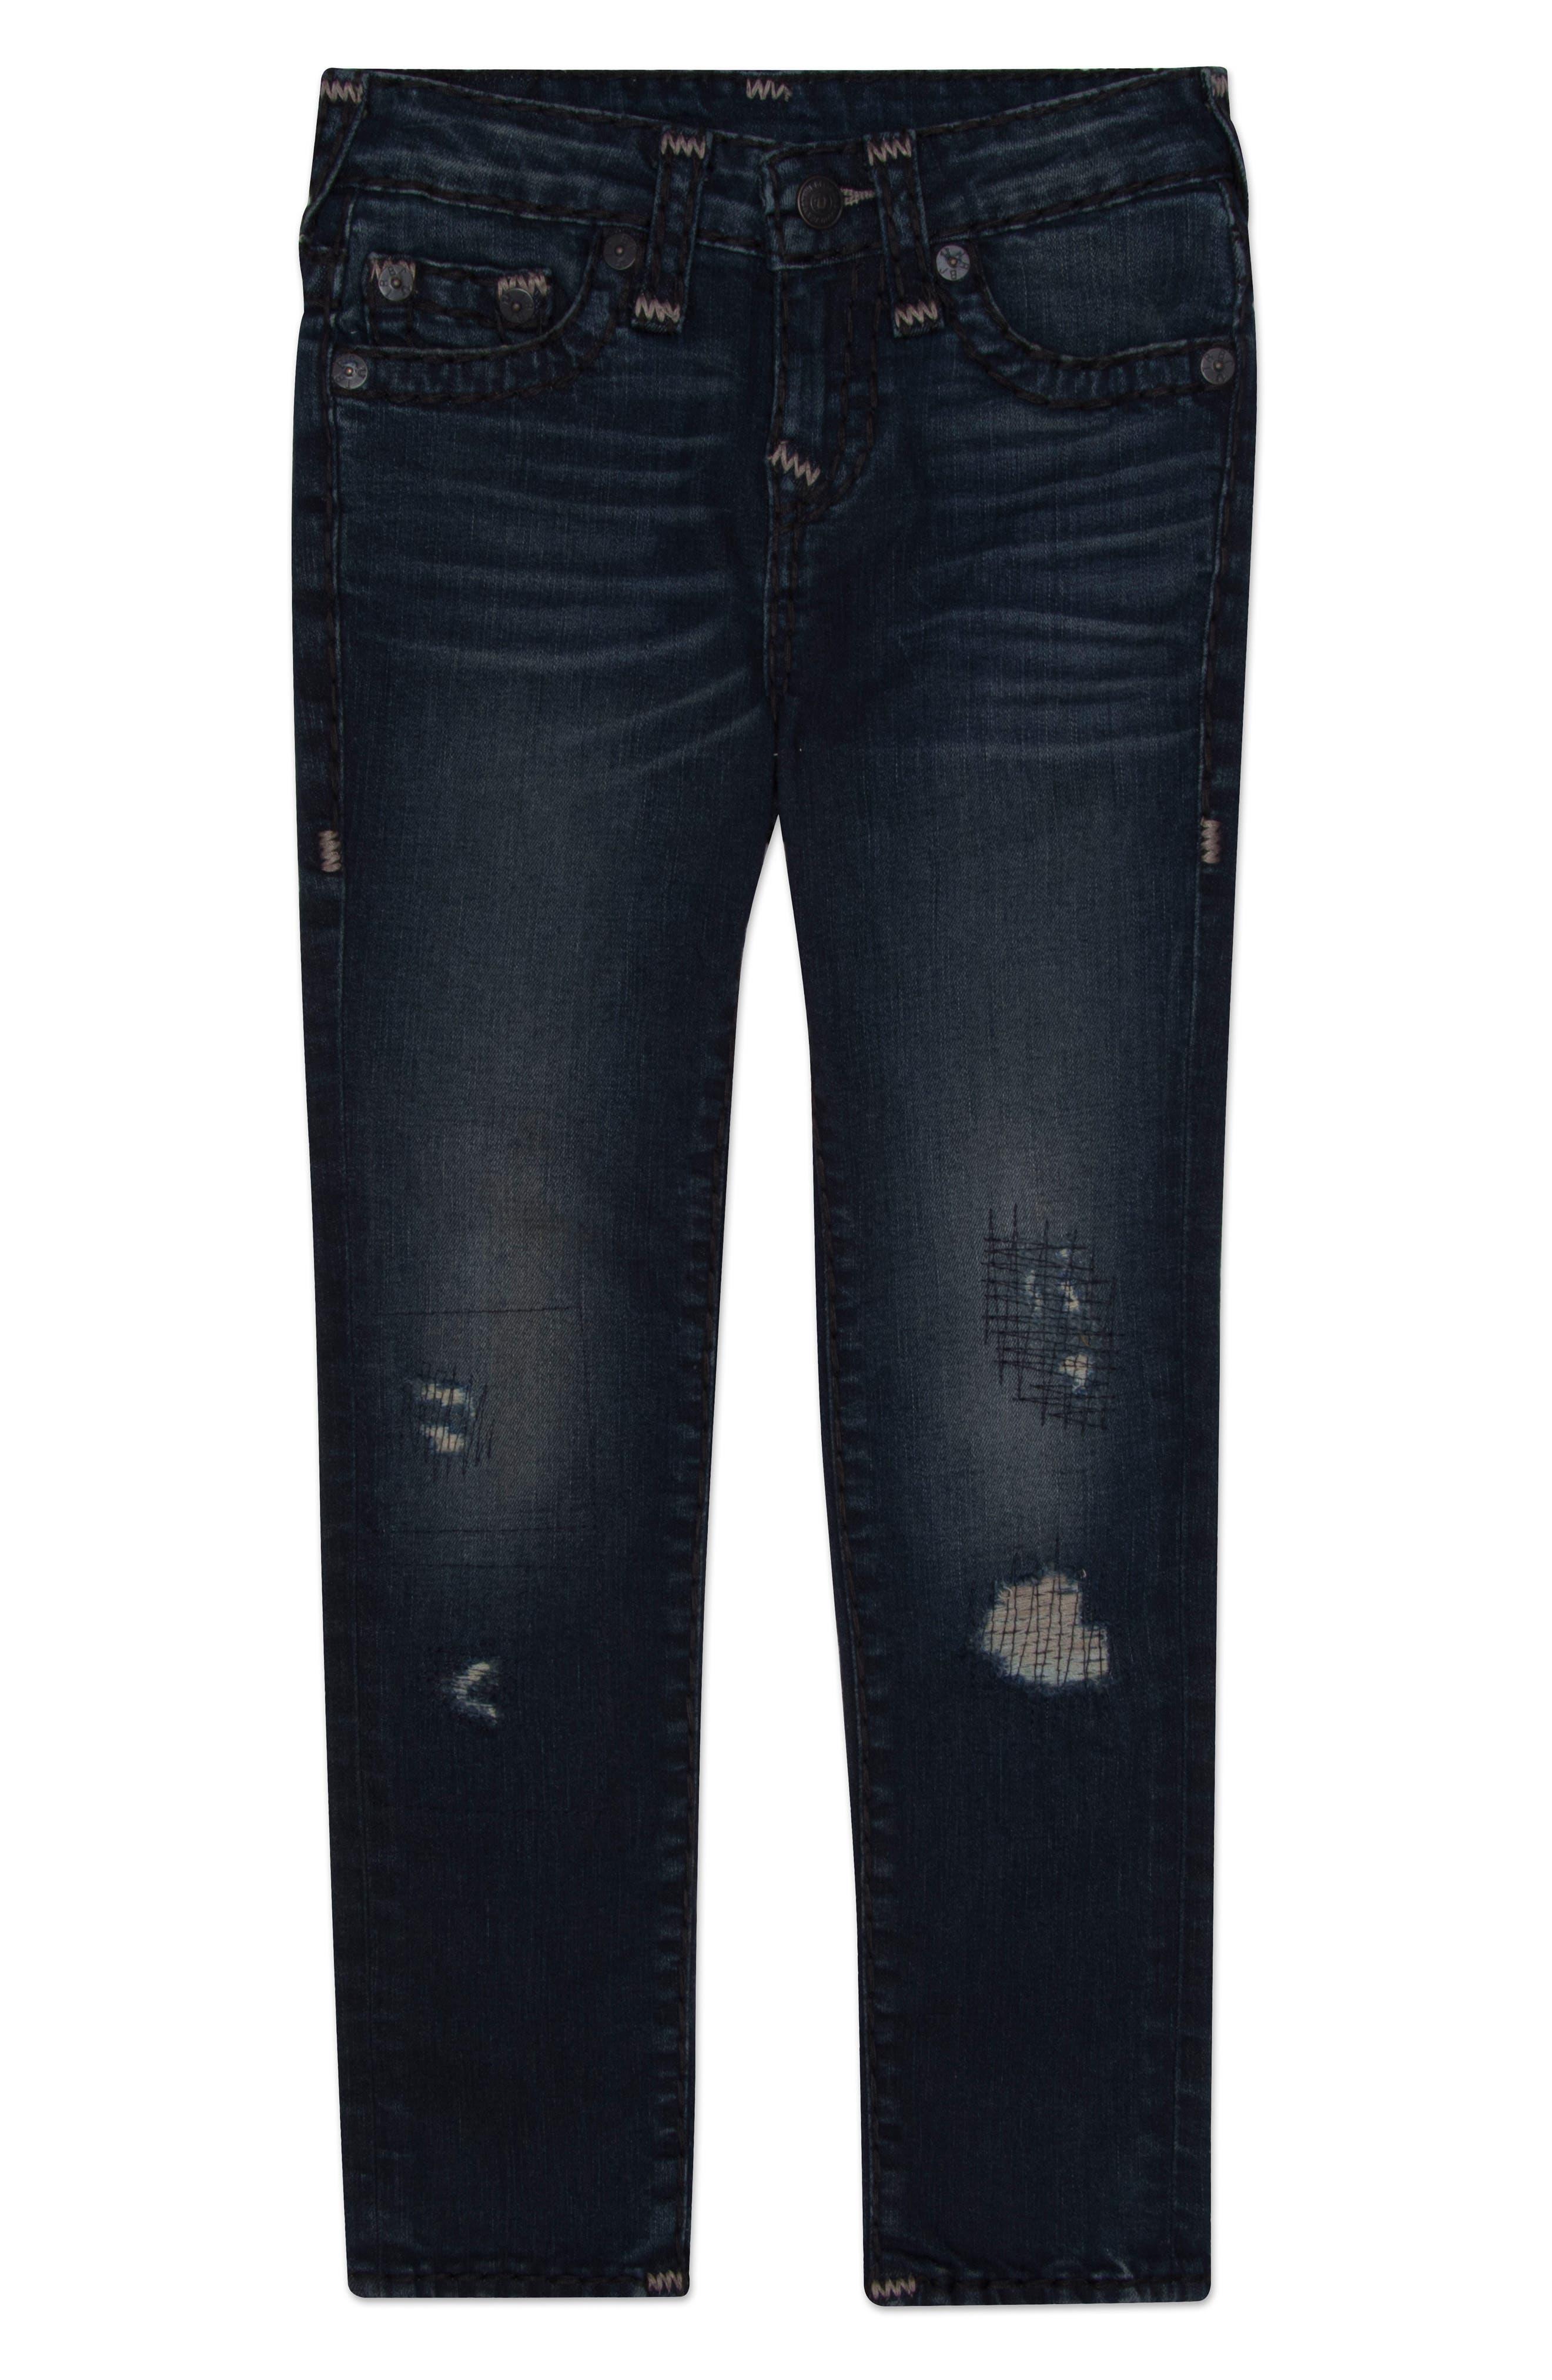 Geno Super T Jeans,                         Main,                         color, 022